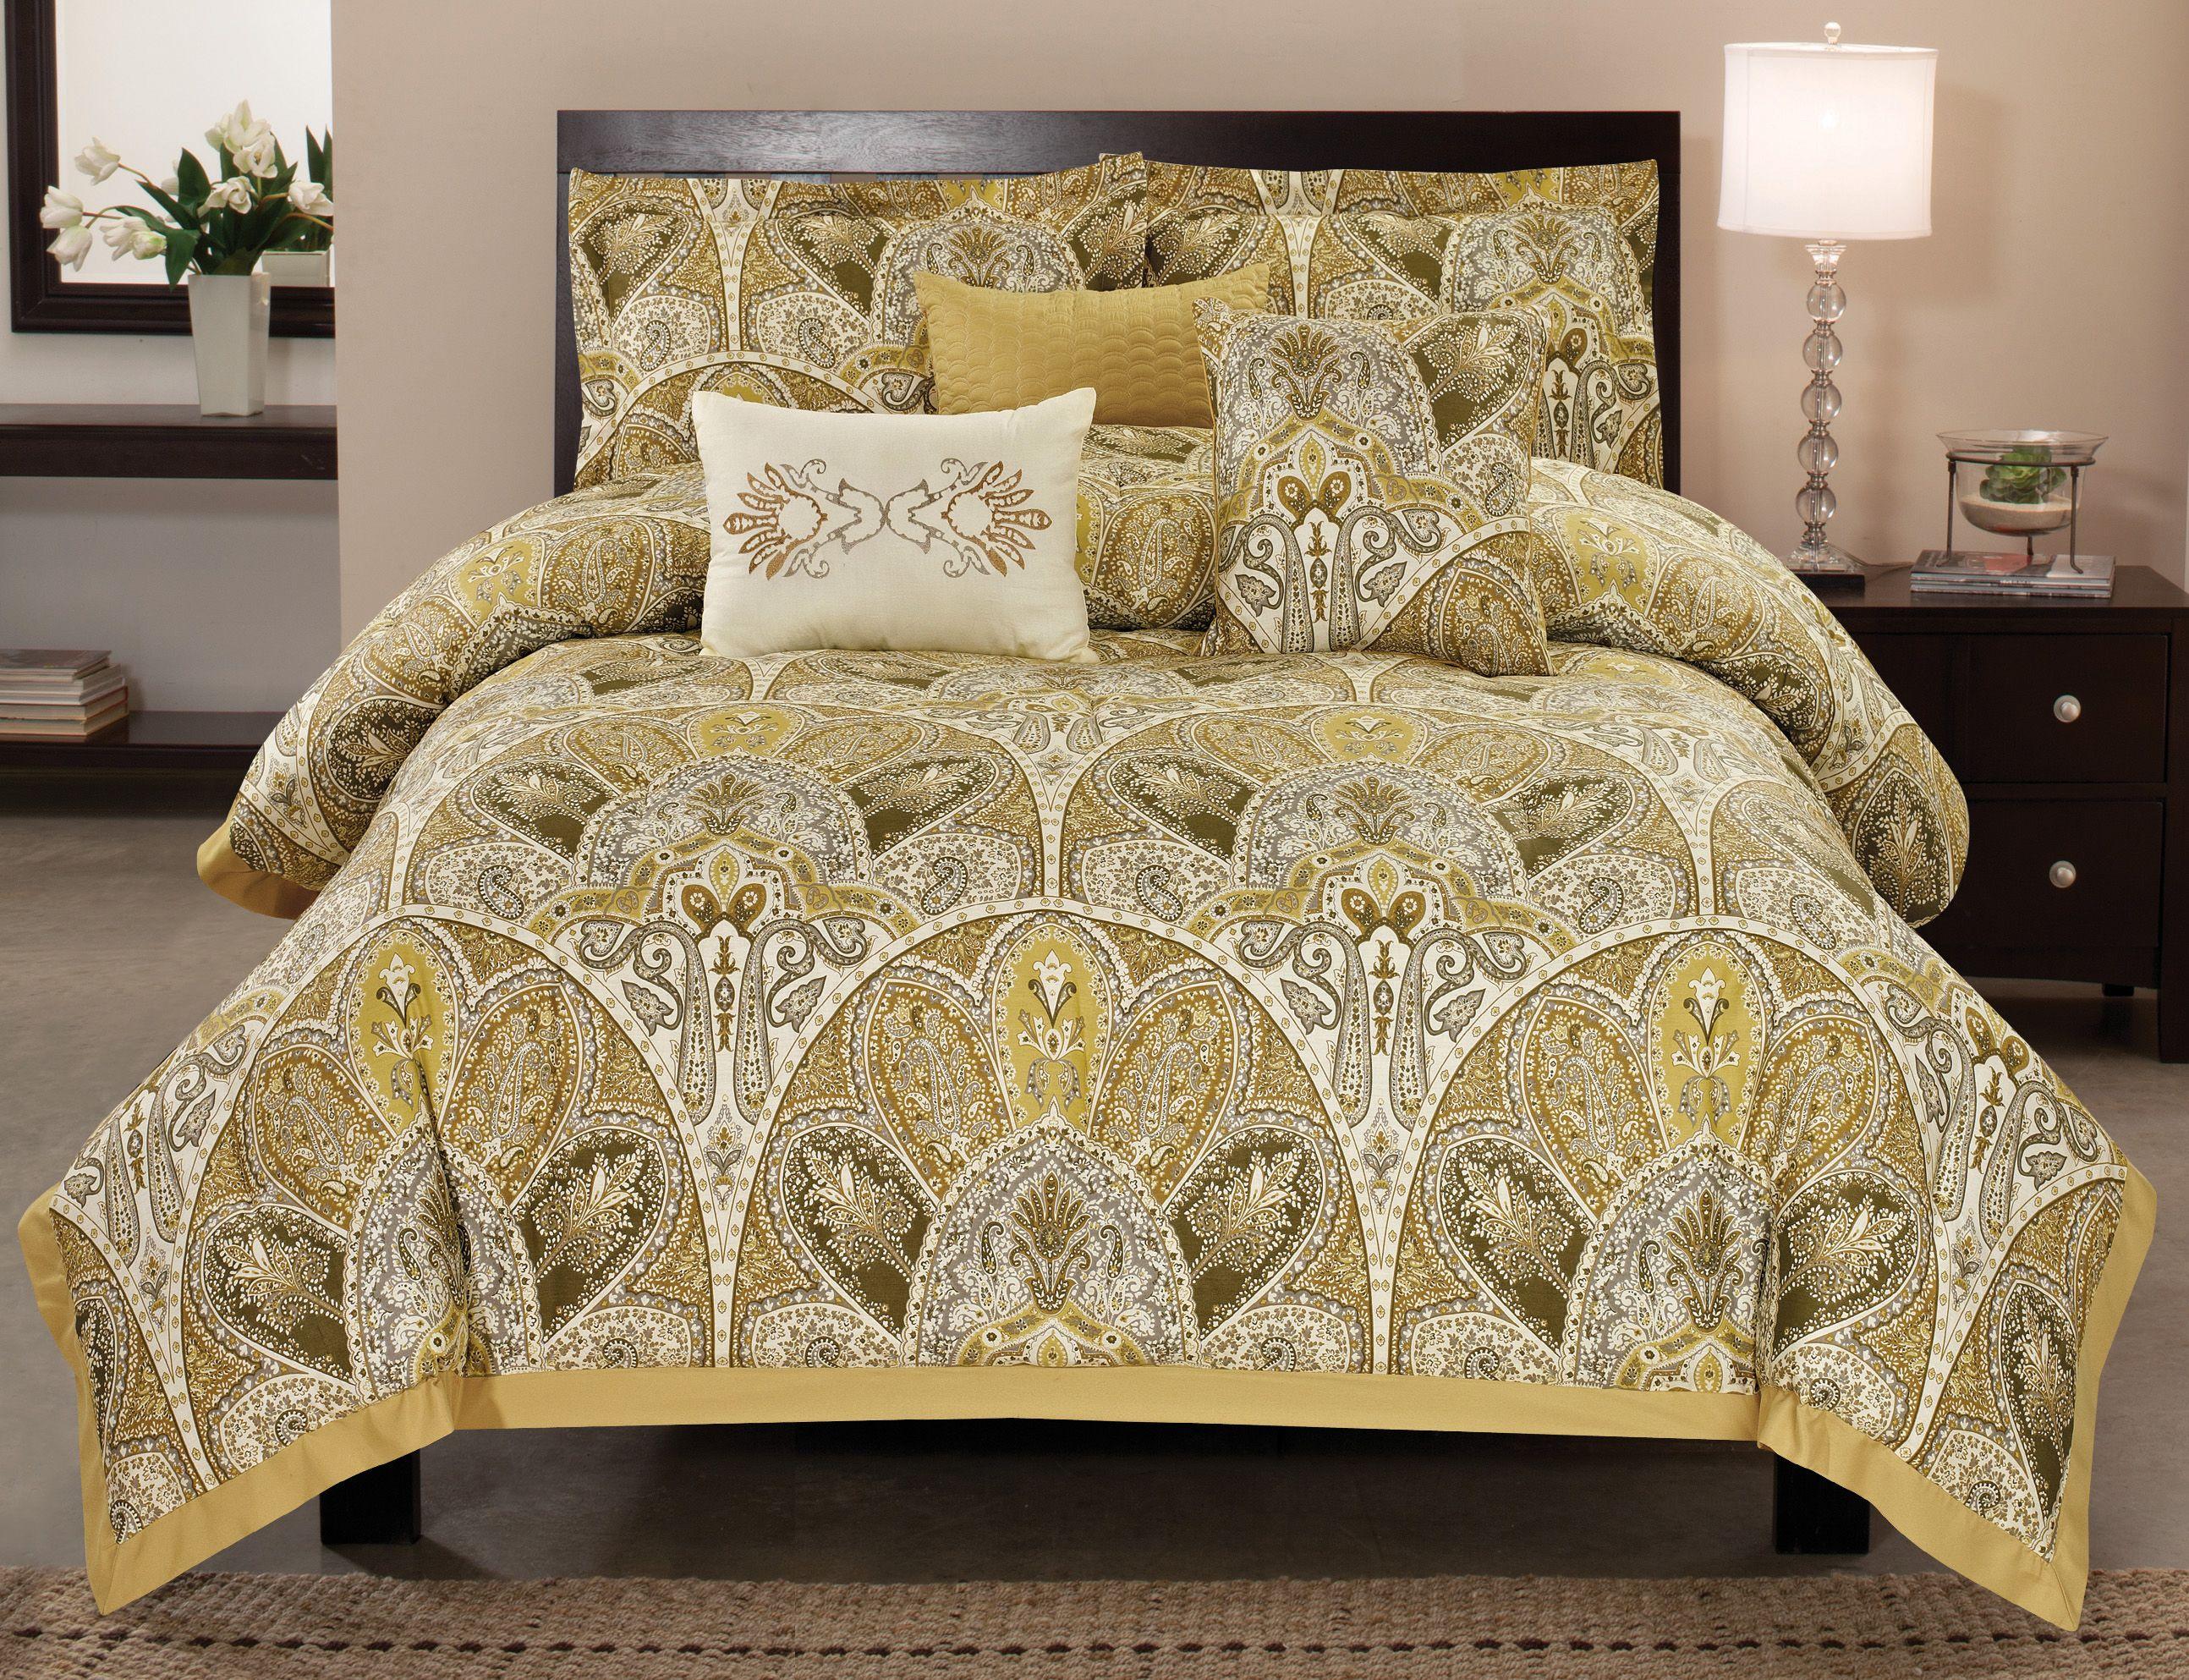 Amaretto Comforter by Ramallah Trading Comforter sets